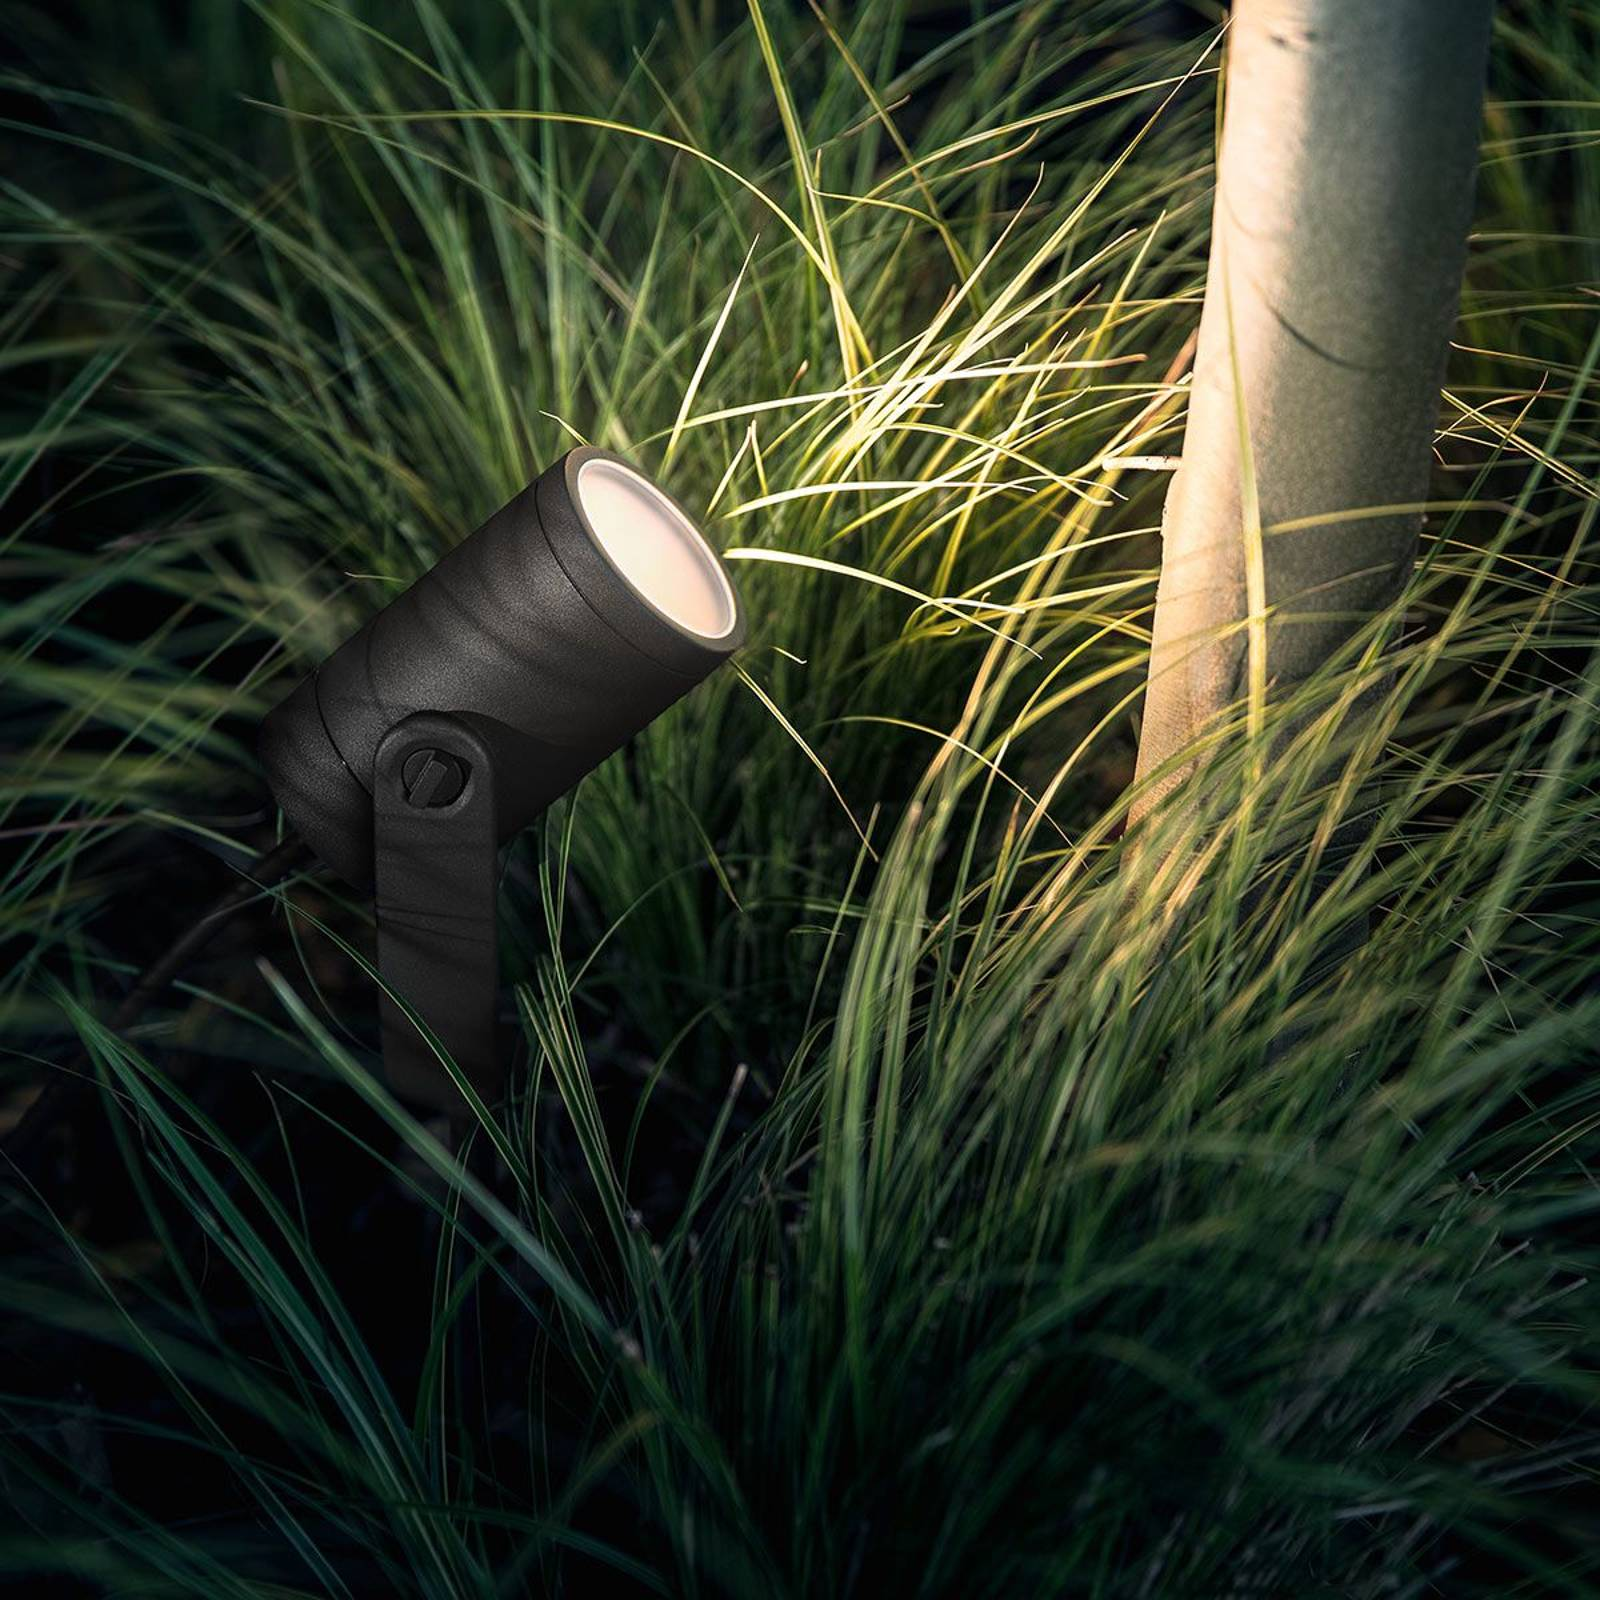 Philips Hue -LED-spotti Lily, ohjaus sovelluksella